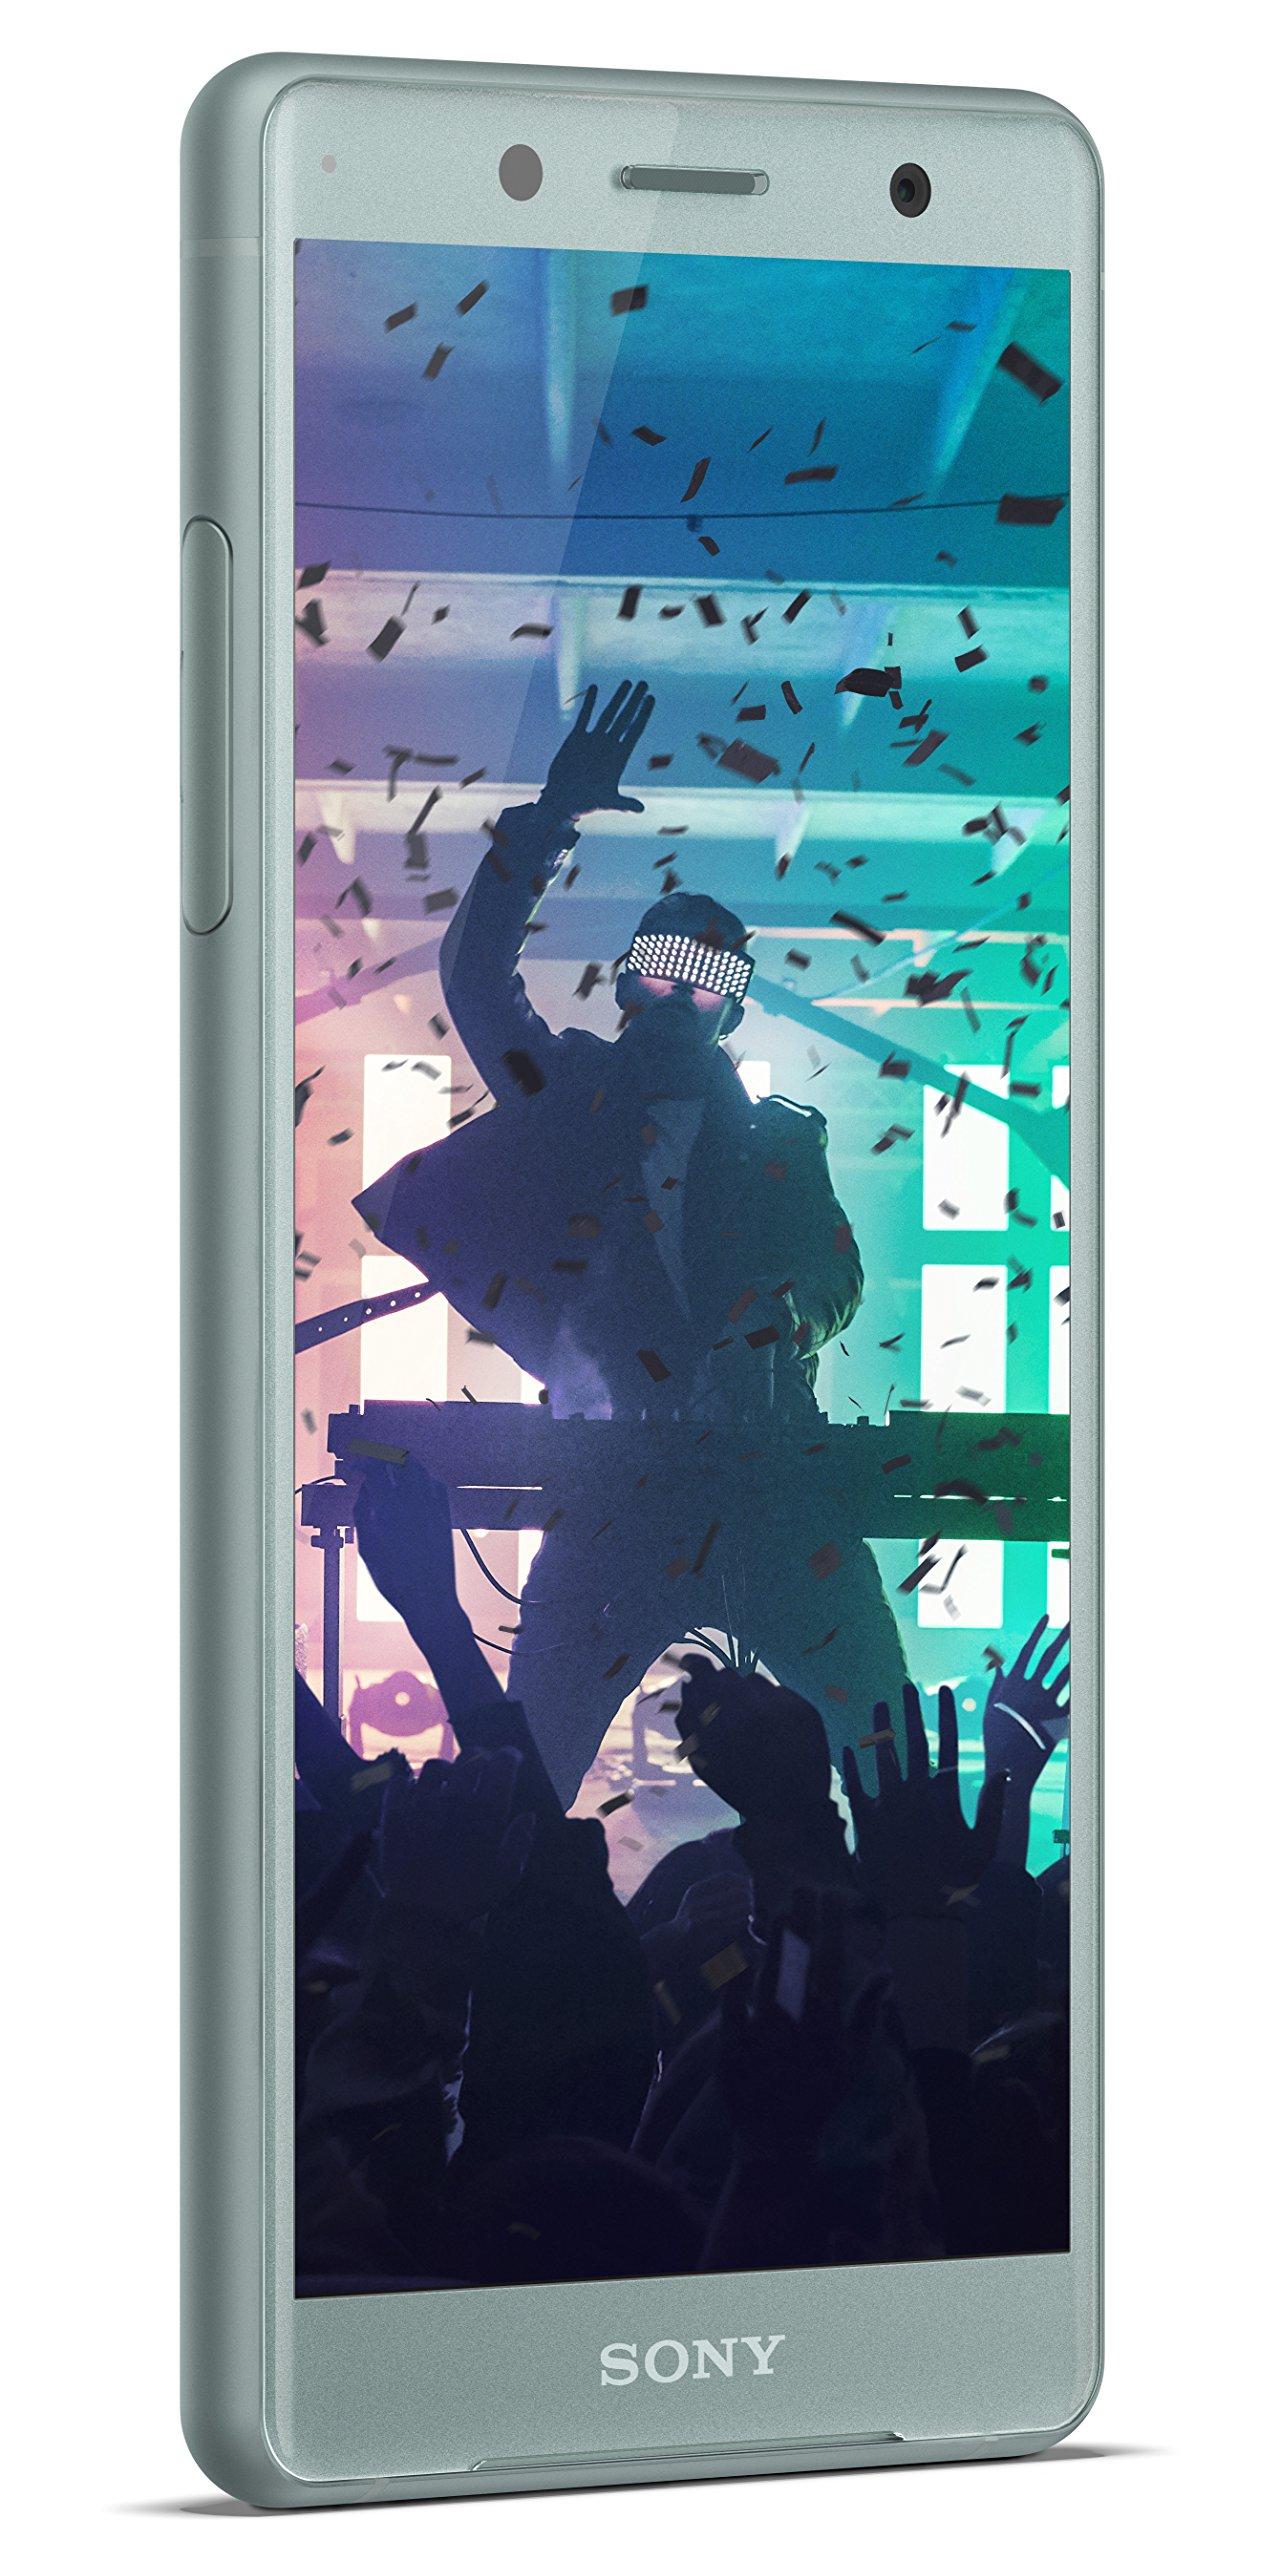 Sony Xperia XZ2 Compact Unlocked Smartphone - 5'' Screen - 64GB - Moss Green (US Warranty)